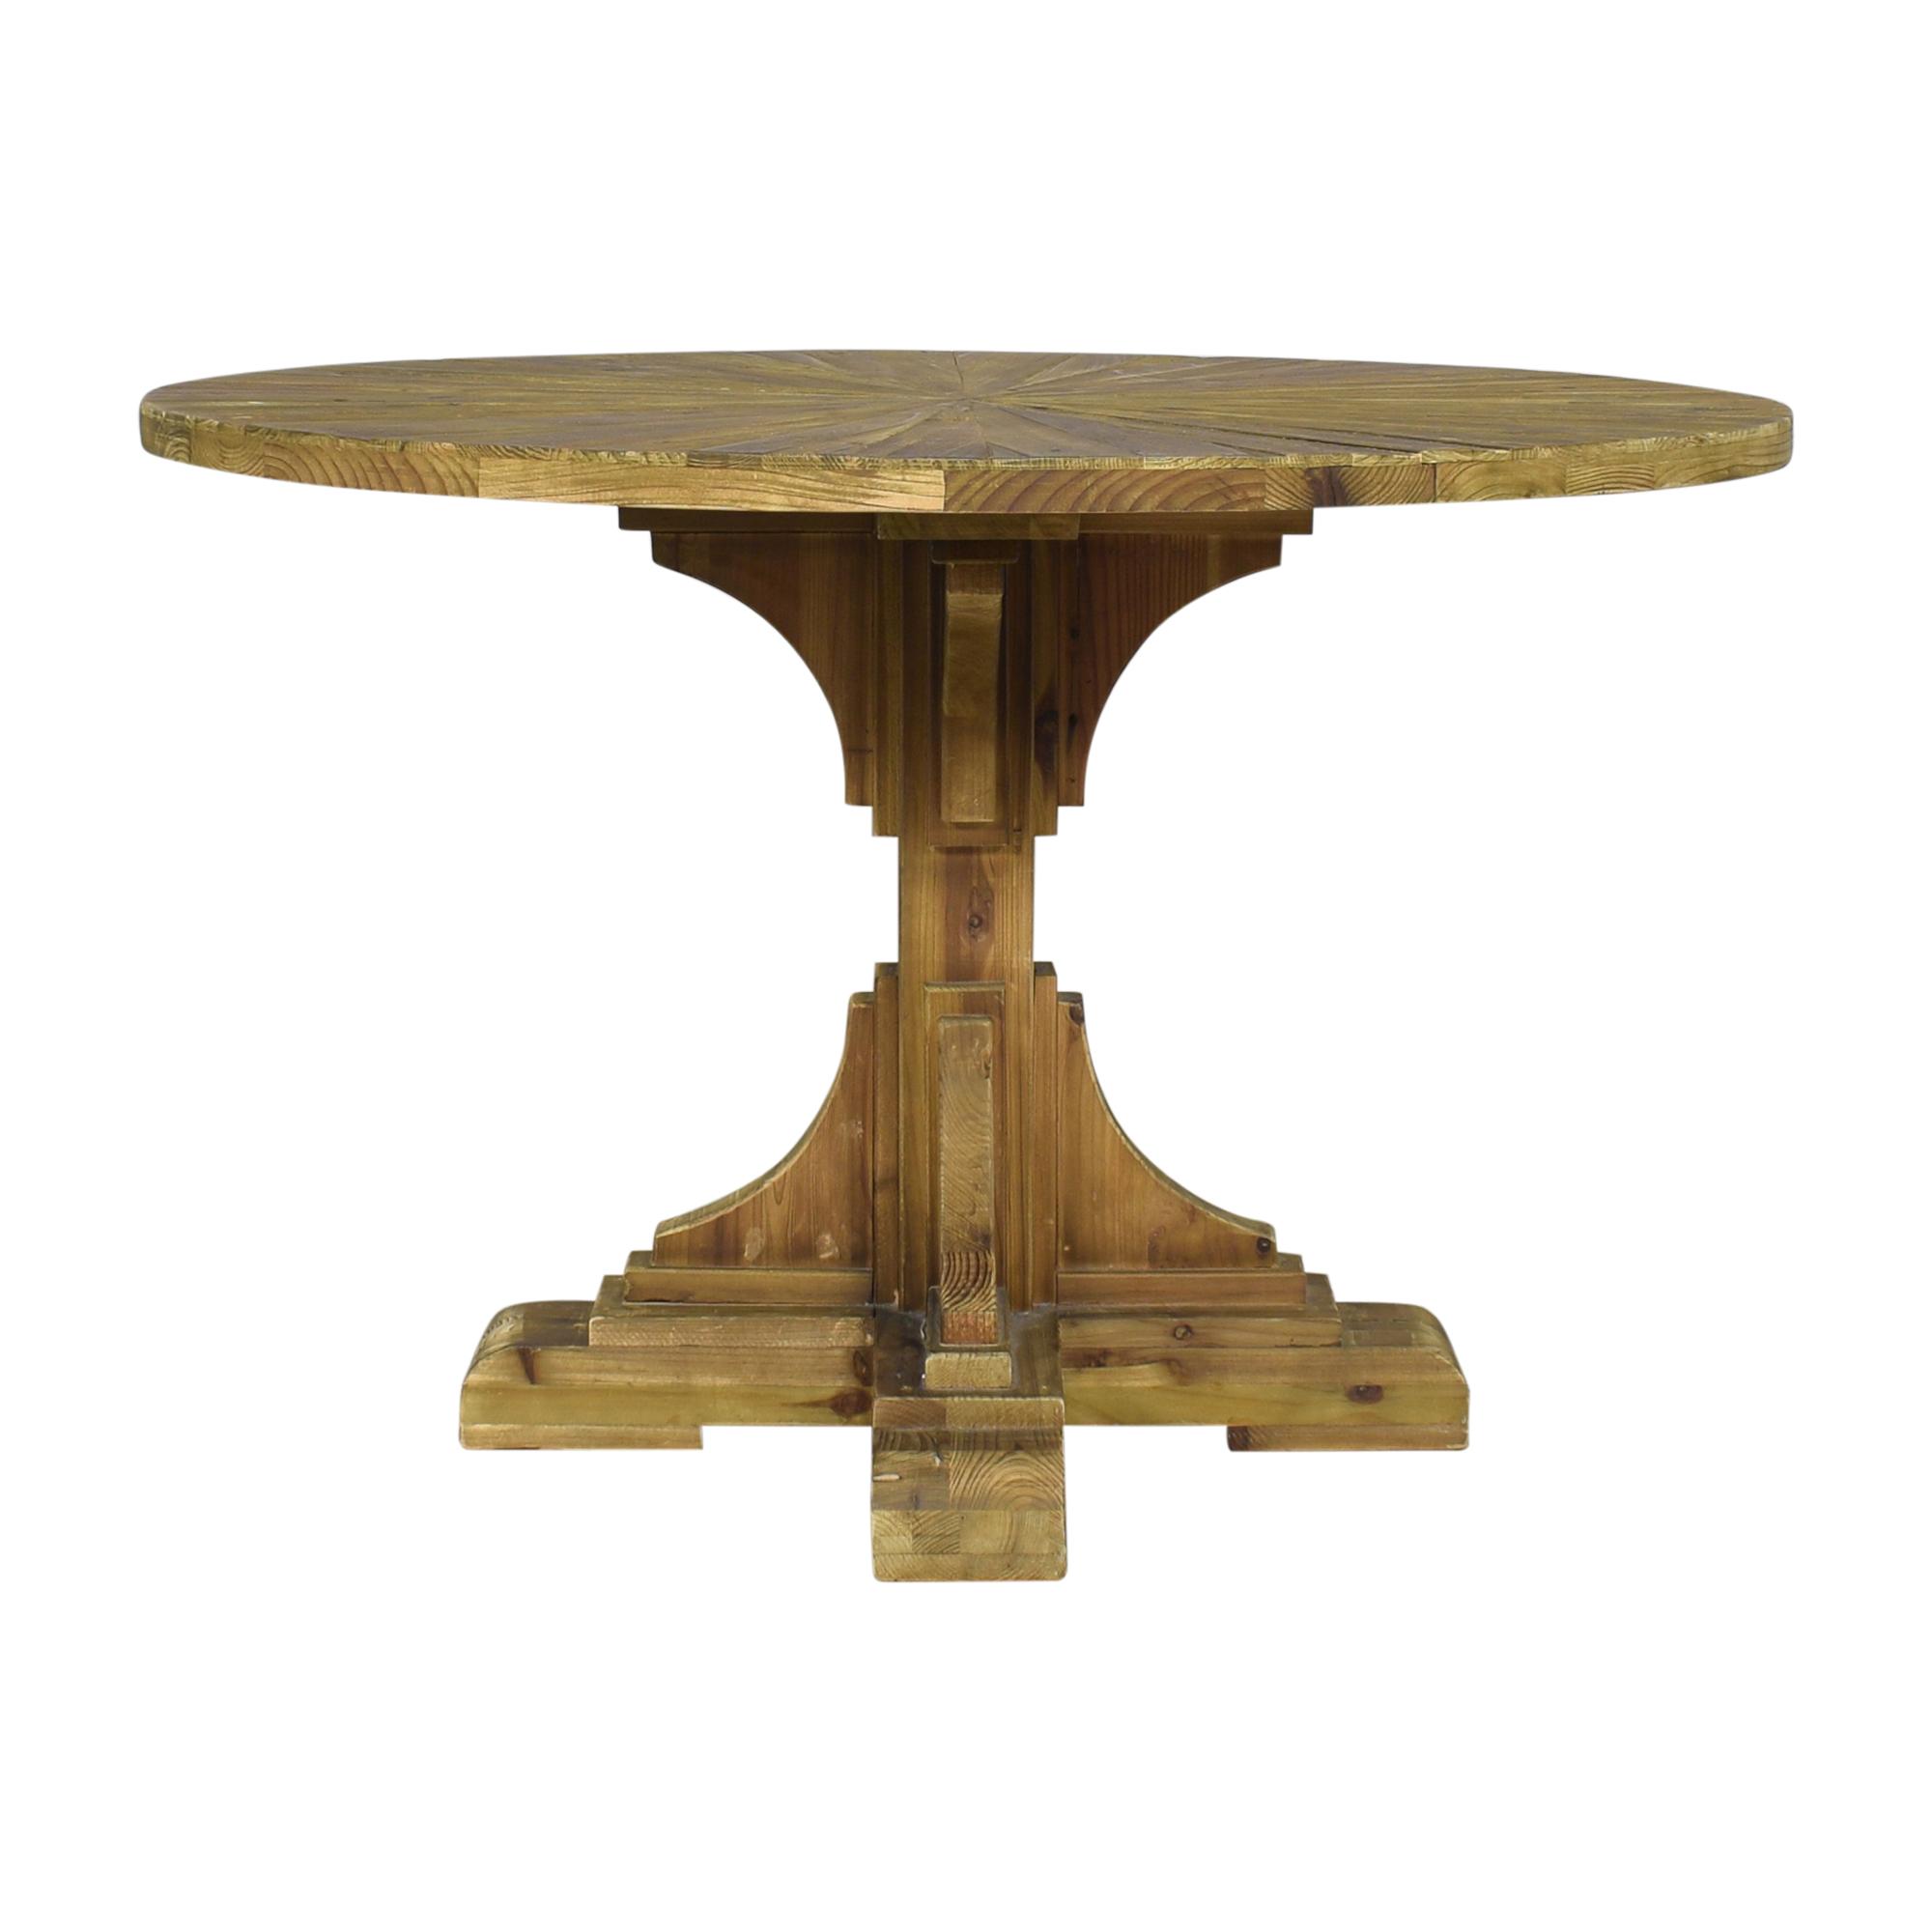 Wayfair Wayfair One Allium Way Davi Pedestal Dining Table dimensions